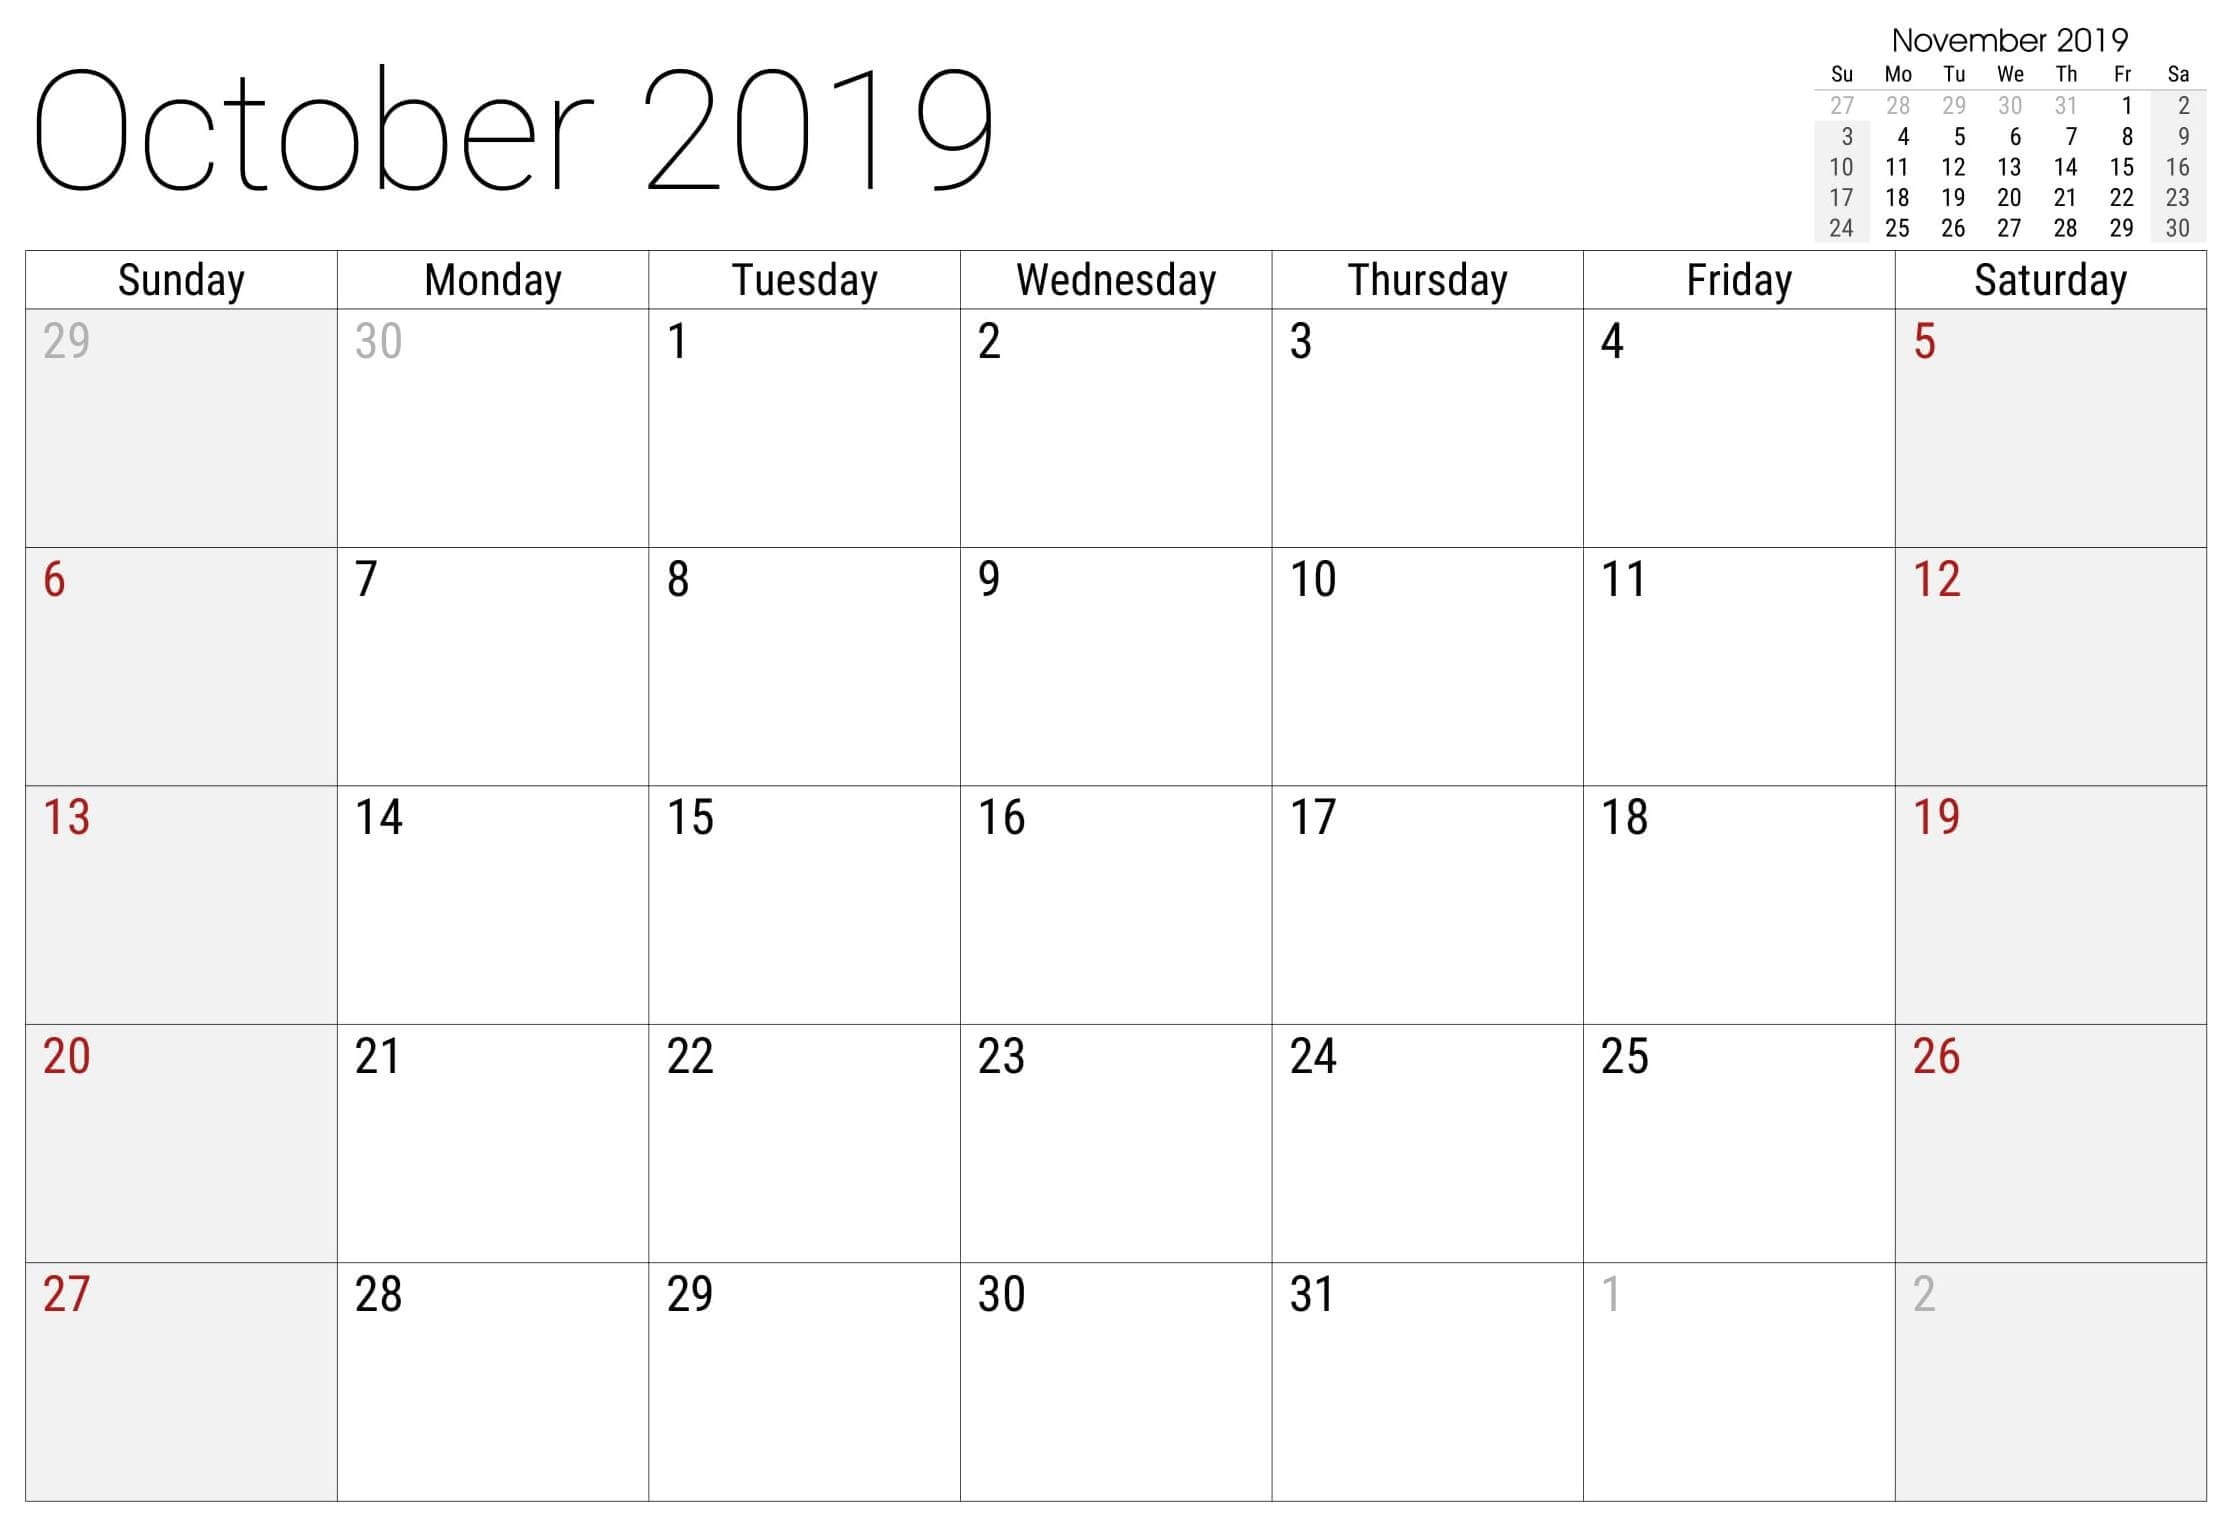 October 2019 Calendar Editable